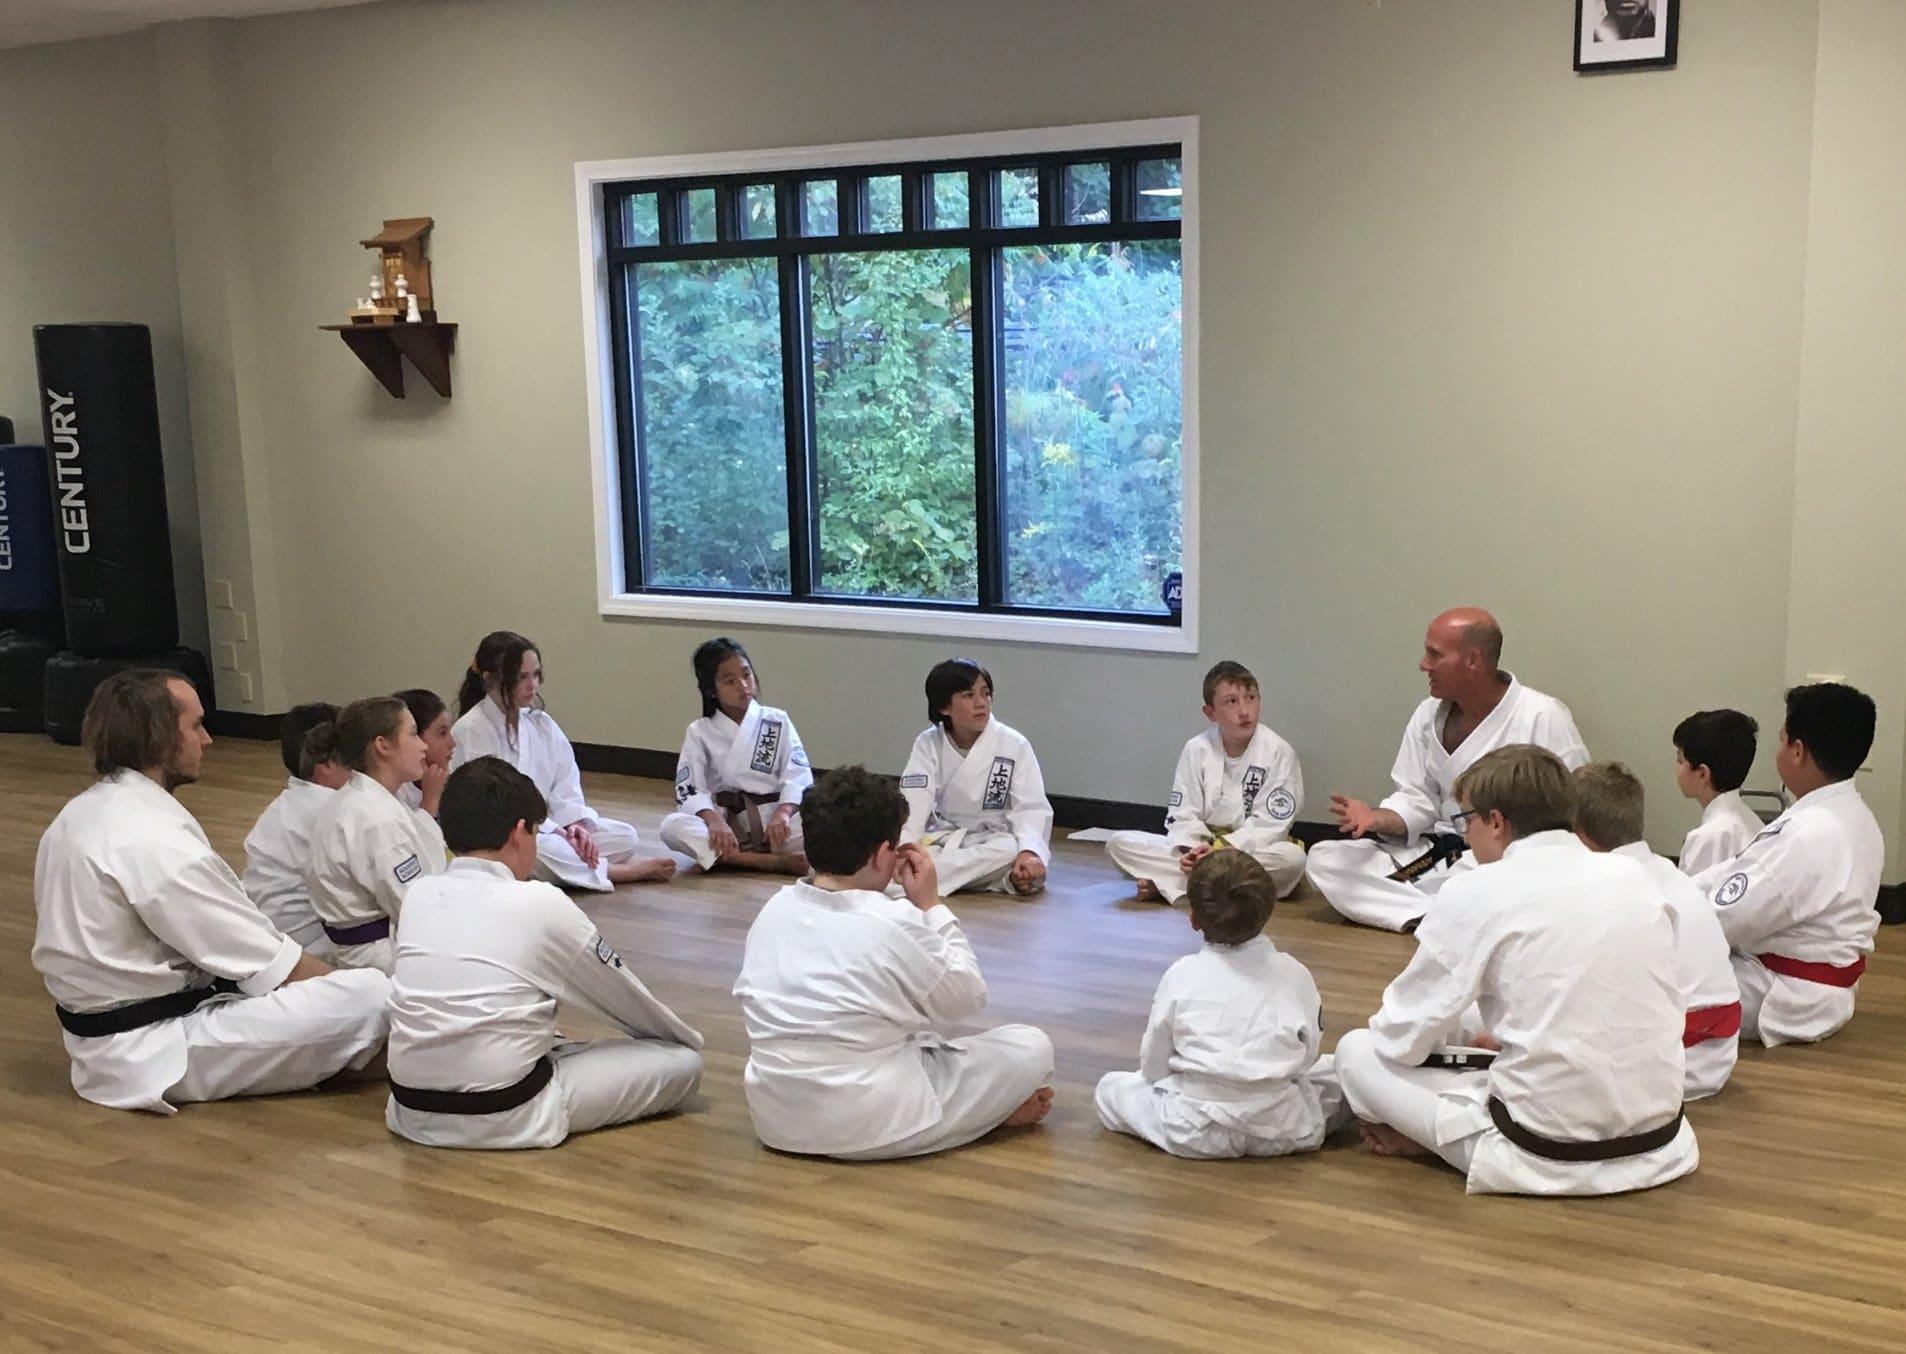 Sensei Neil Stone Mentoring a group of students